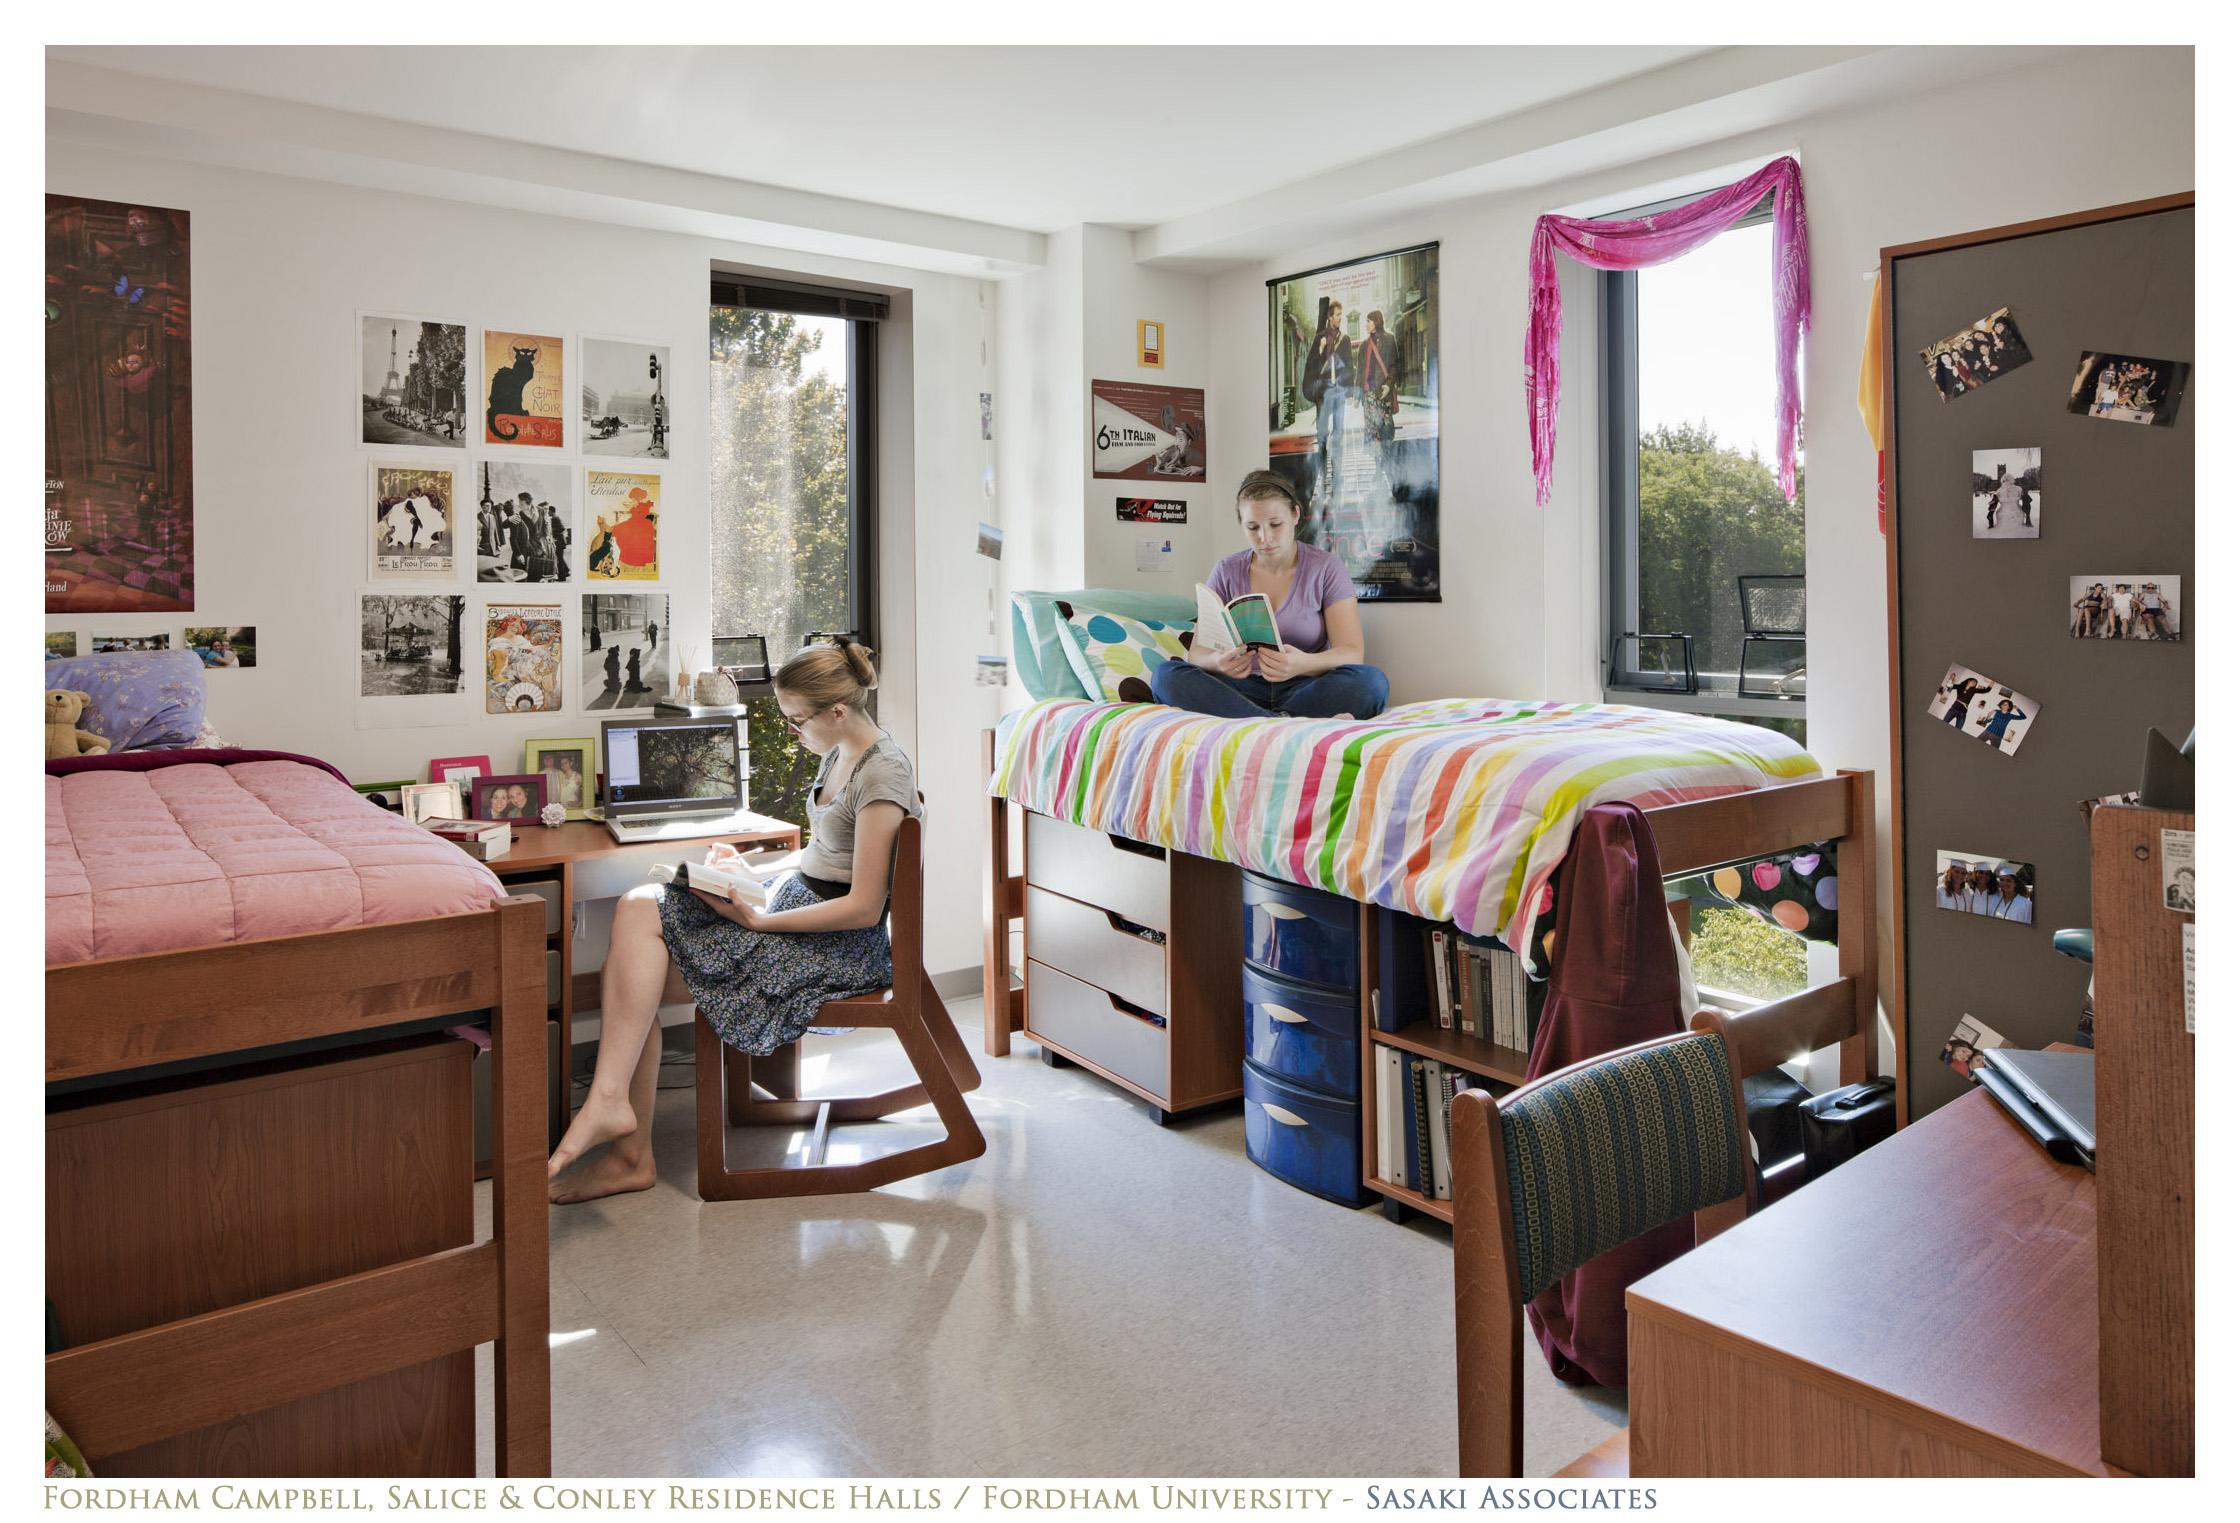 012_Robert-Benson-Photography-Sasaki-Associates_Fordham-Residence-Hall-38.JPG